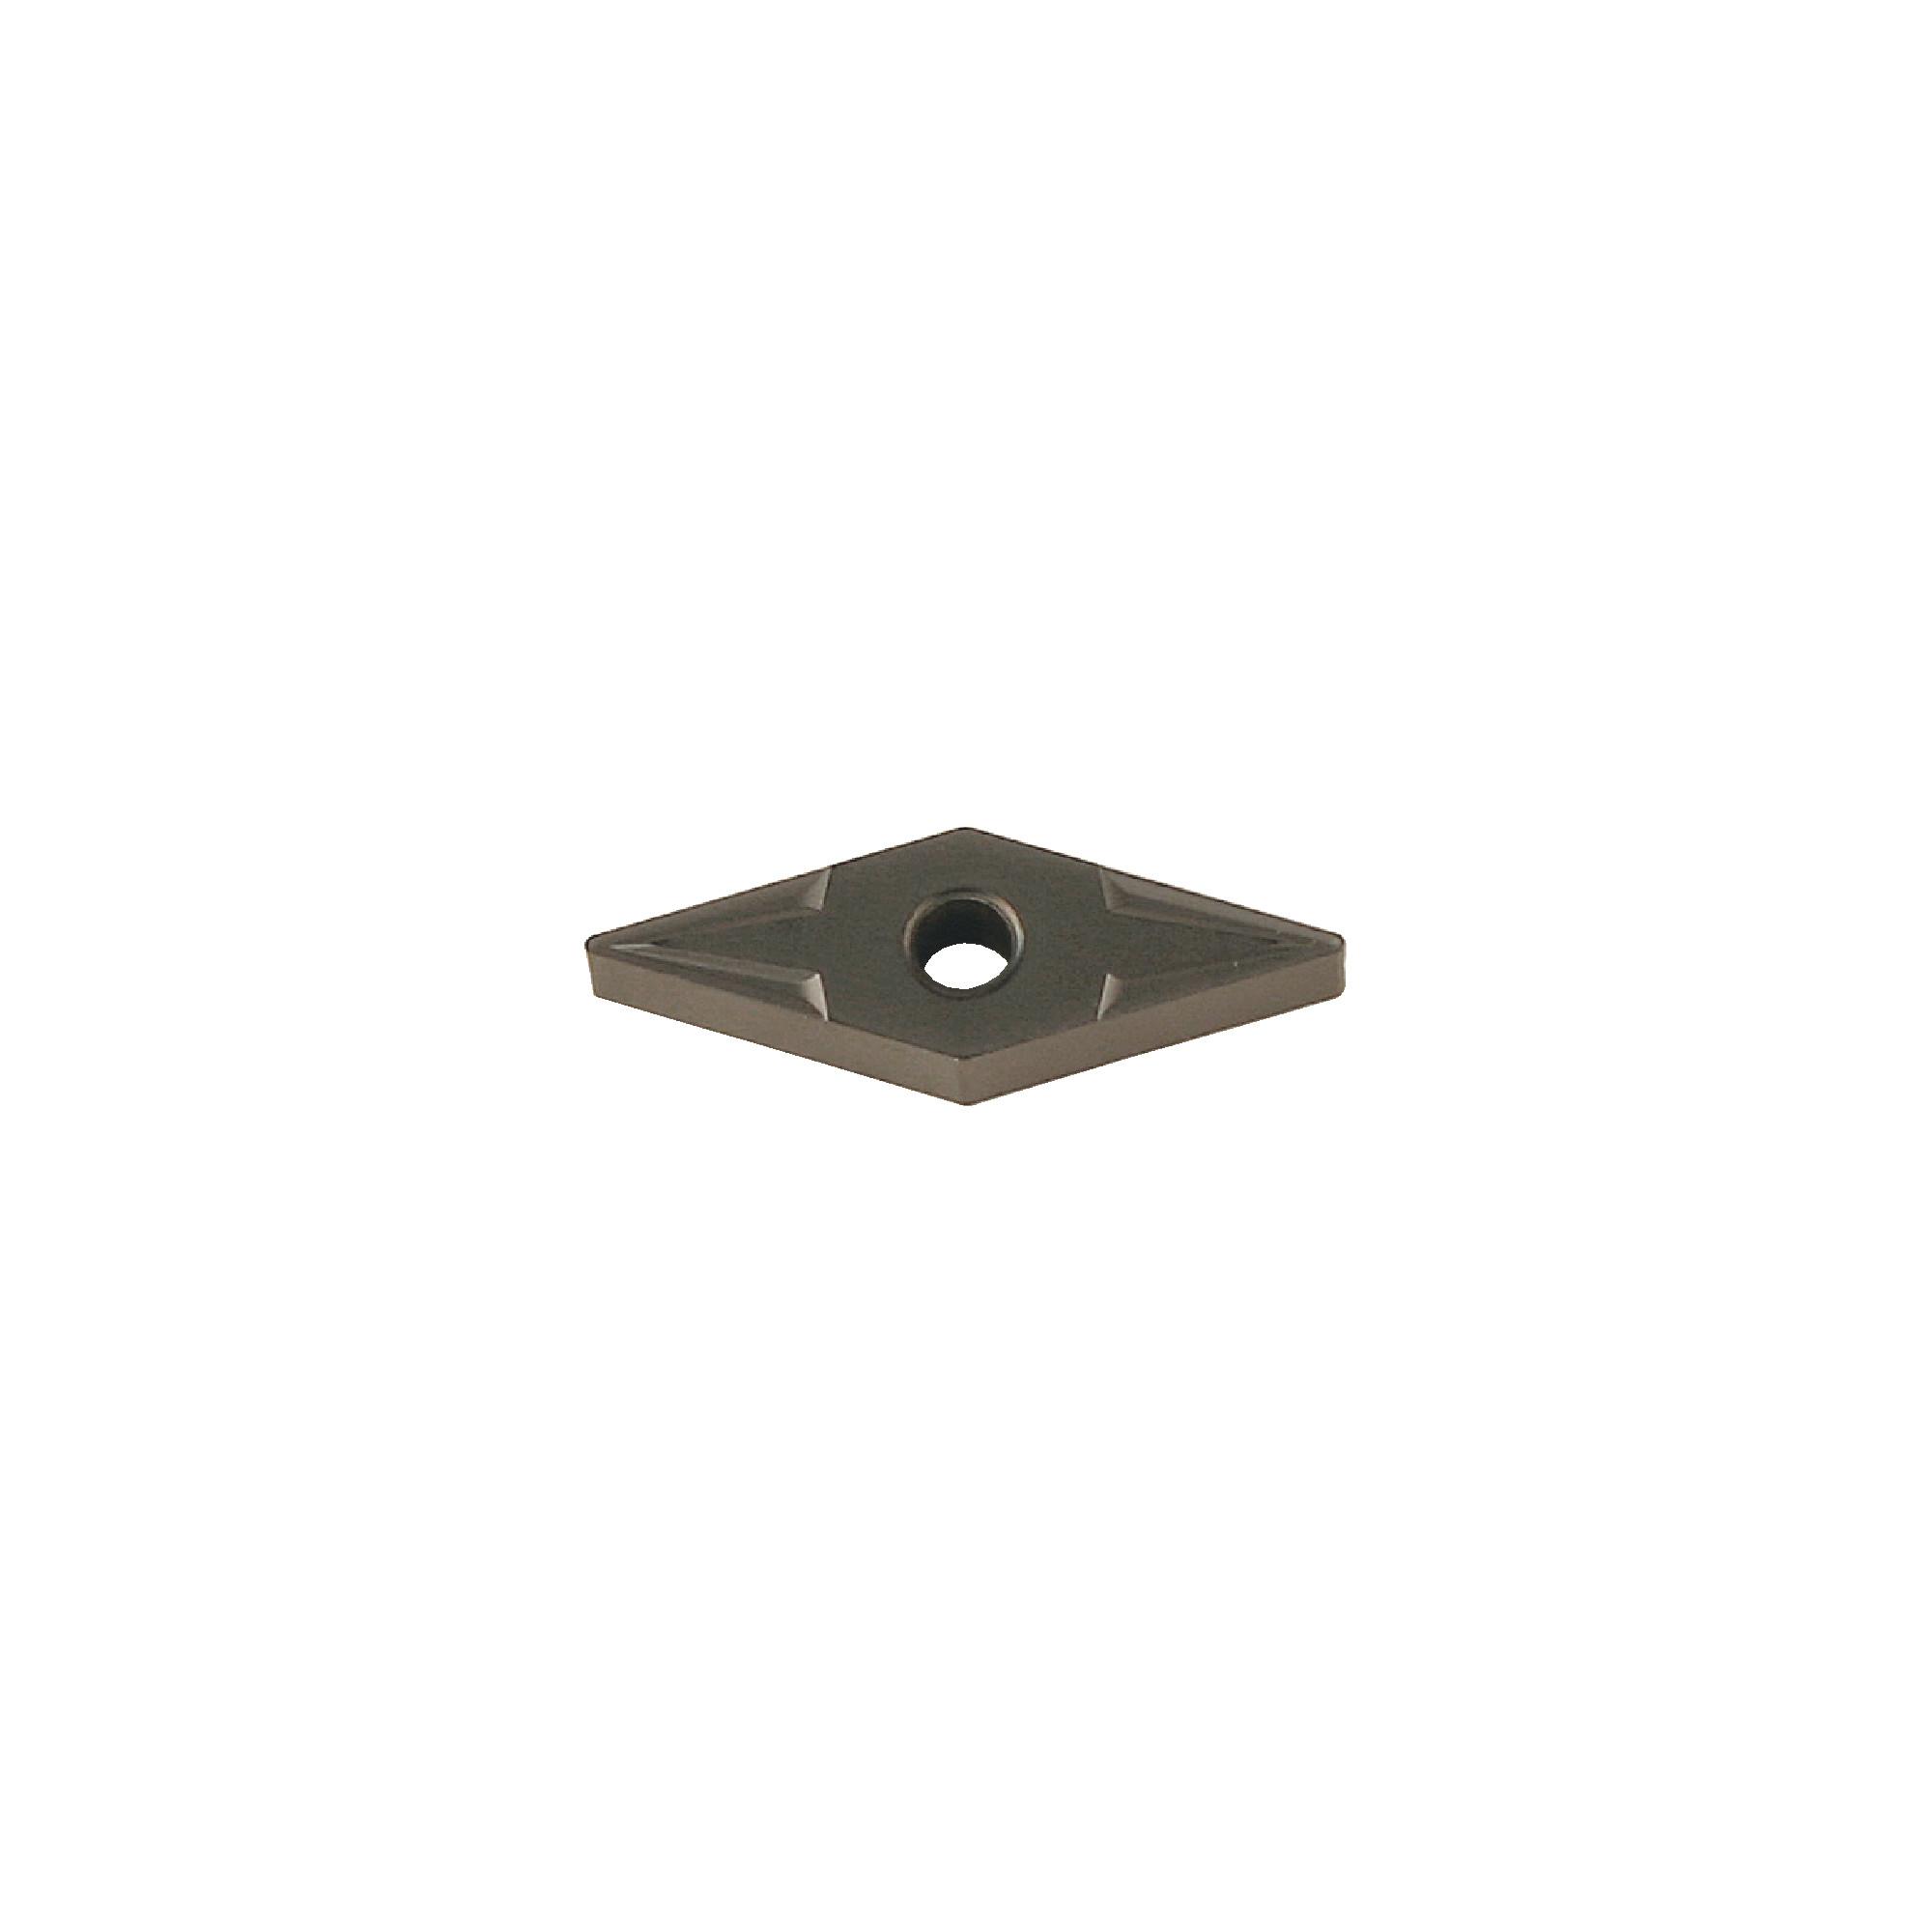 LAMINA - VBMT332-NN LT10 - 35° Diamond / Indexable Carbide Turning Insert